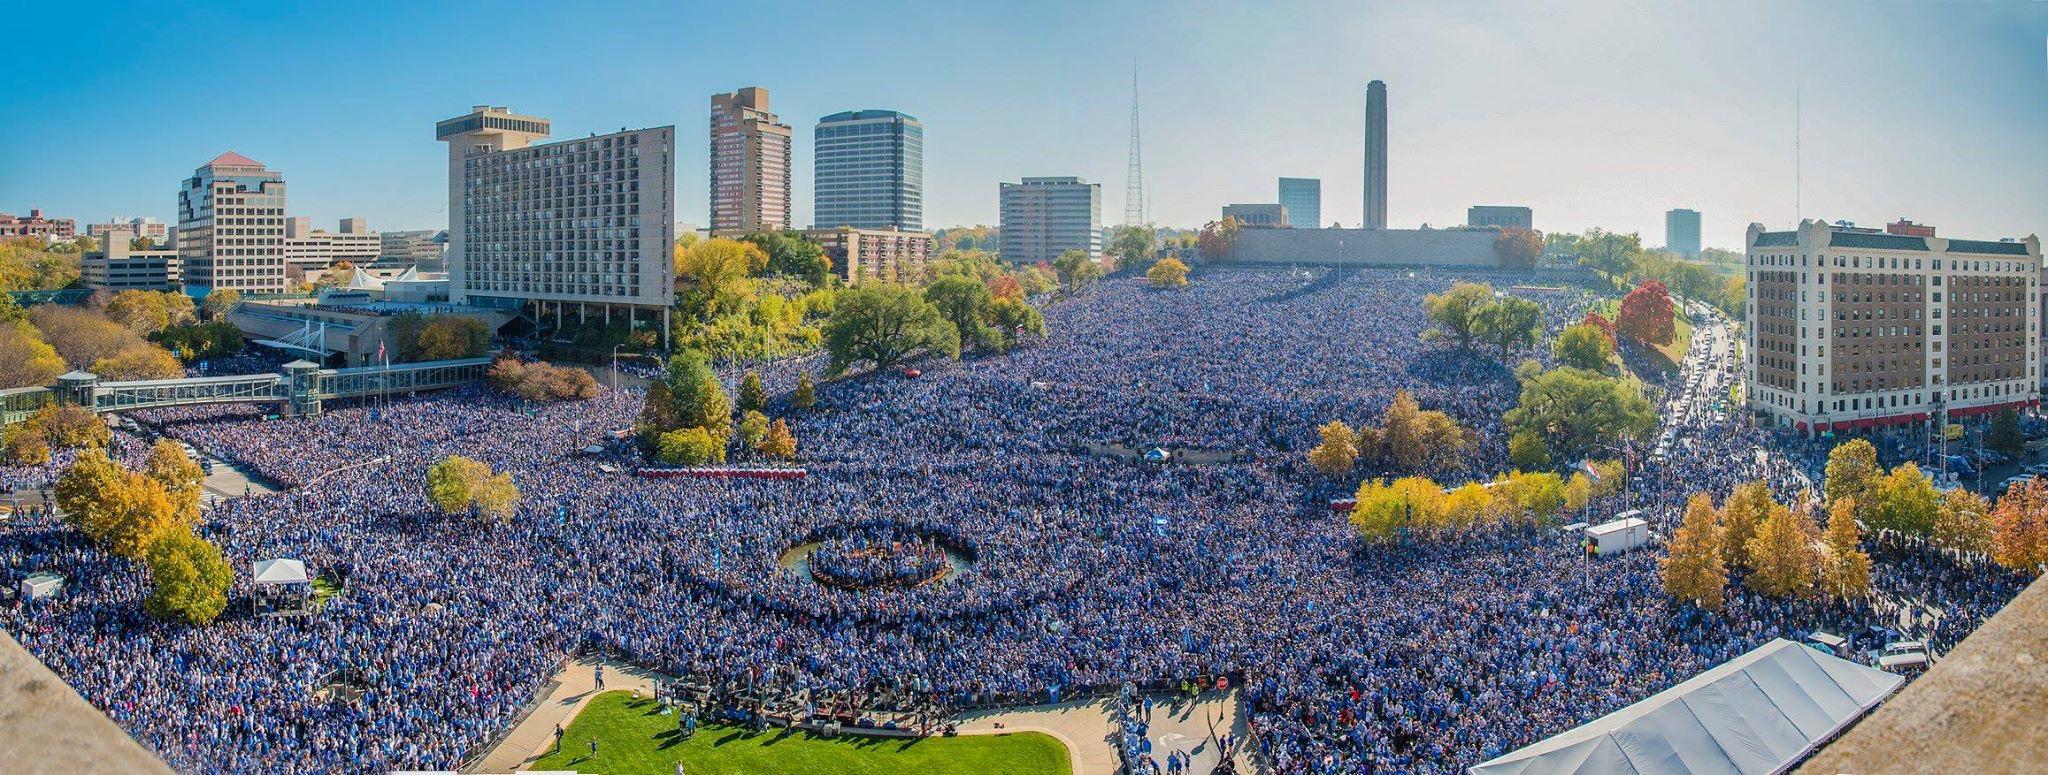 Kansas City Royals 2015 World Series Parade